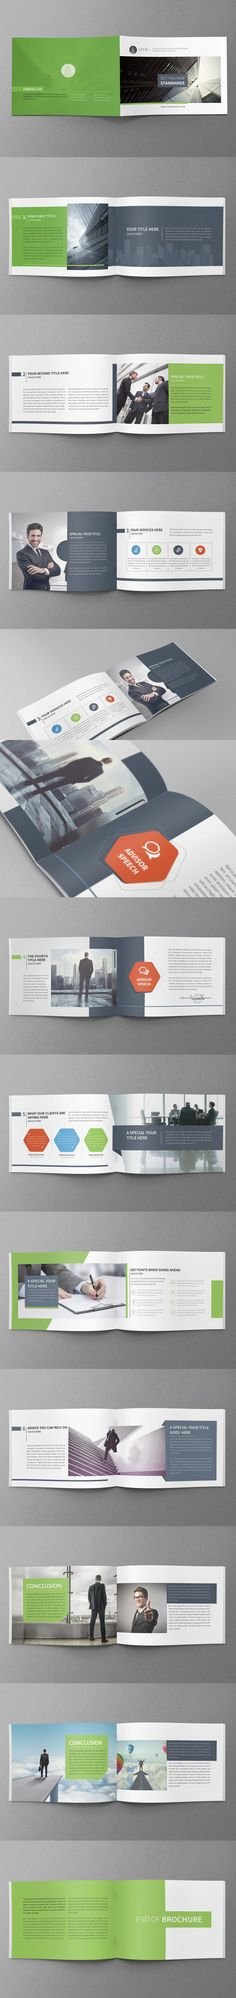 Minimal Business Brochure Template PSD - A5